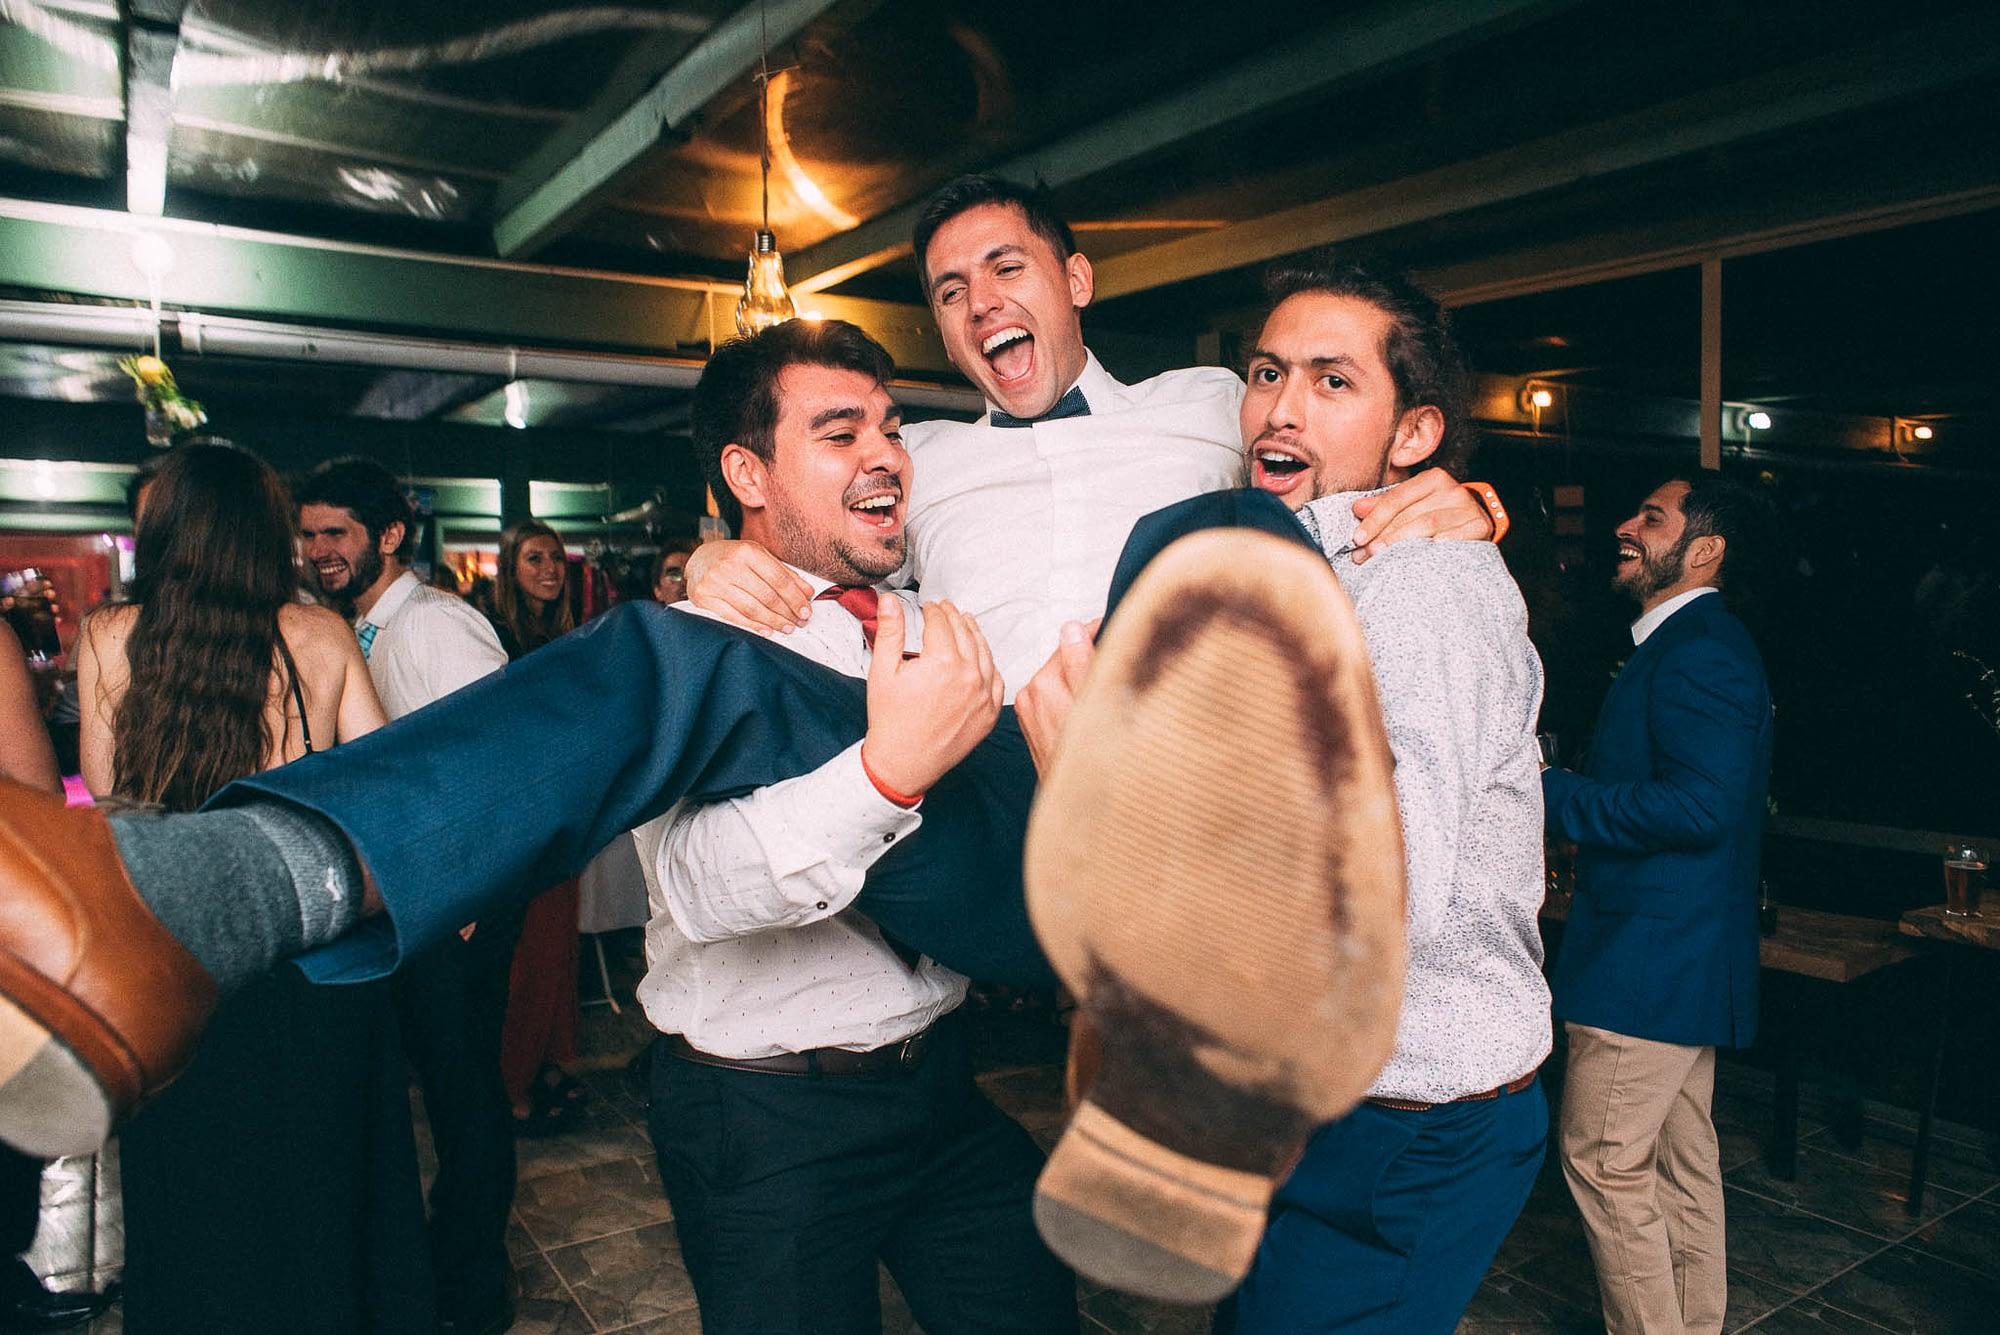 la fragua centro de eventos-purranque-decima region-llanquihue-matrimonio campestre-fotografo documental de matrimonios-fiesta